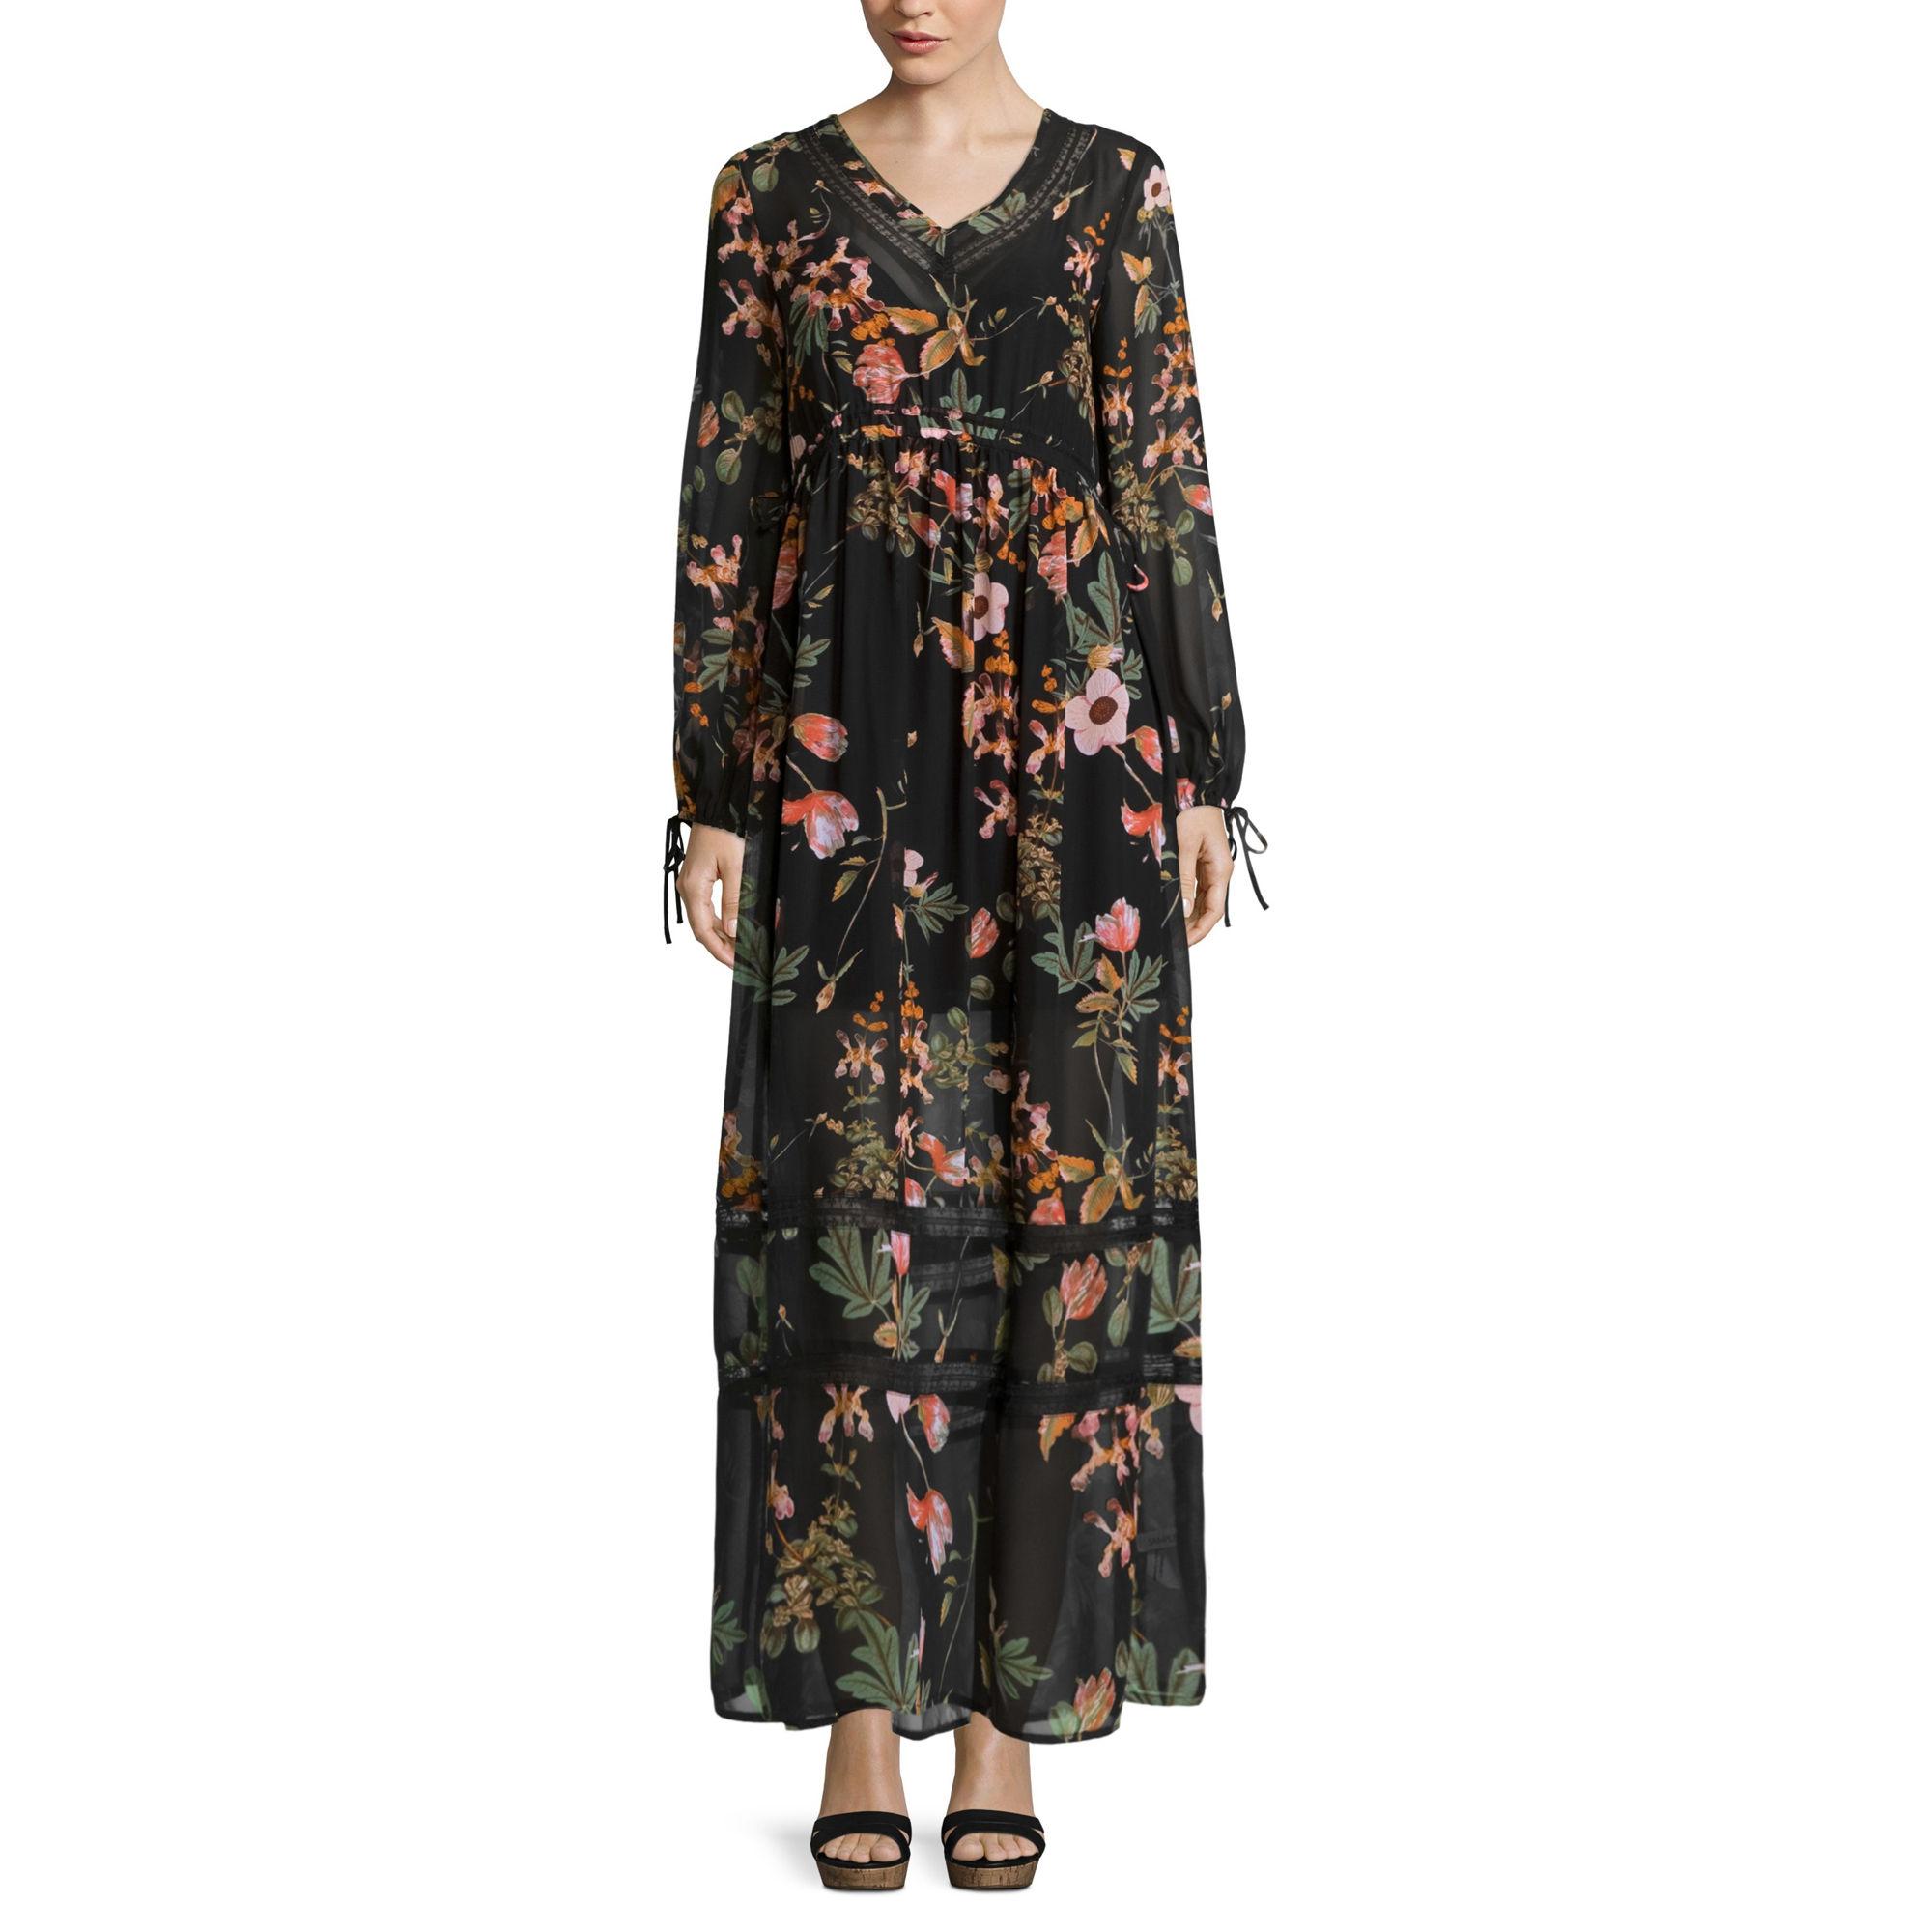 BELLE + SKY Long-Sleeve Floral Maxi Dress